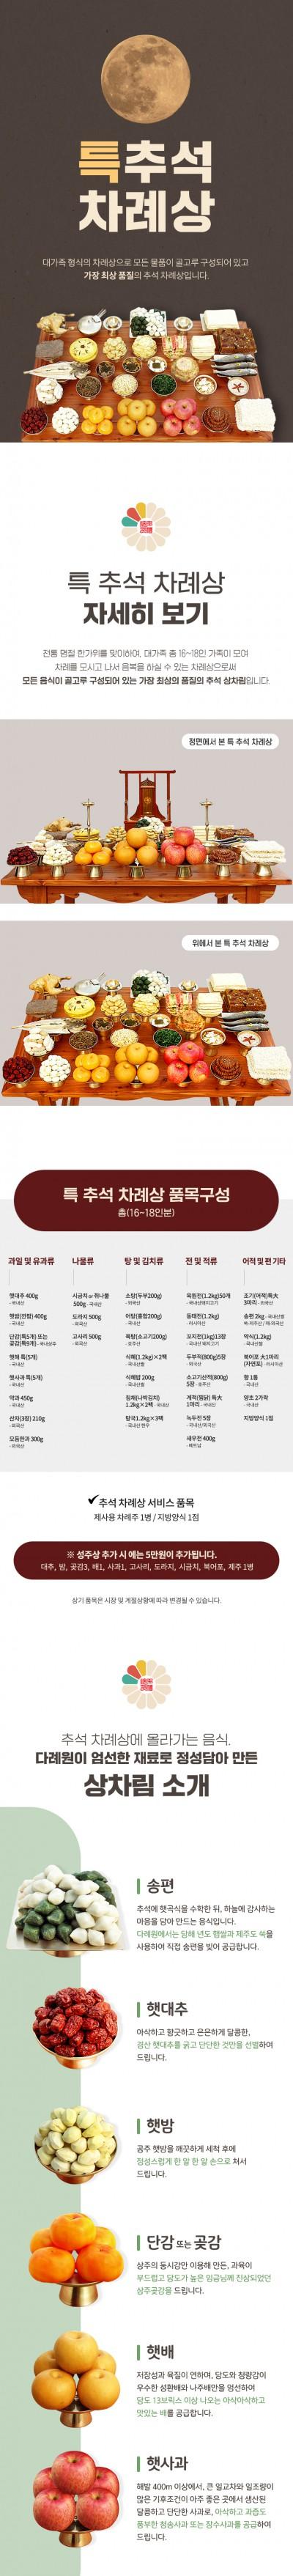 [D195]차례상 상세페이지 제작